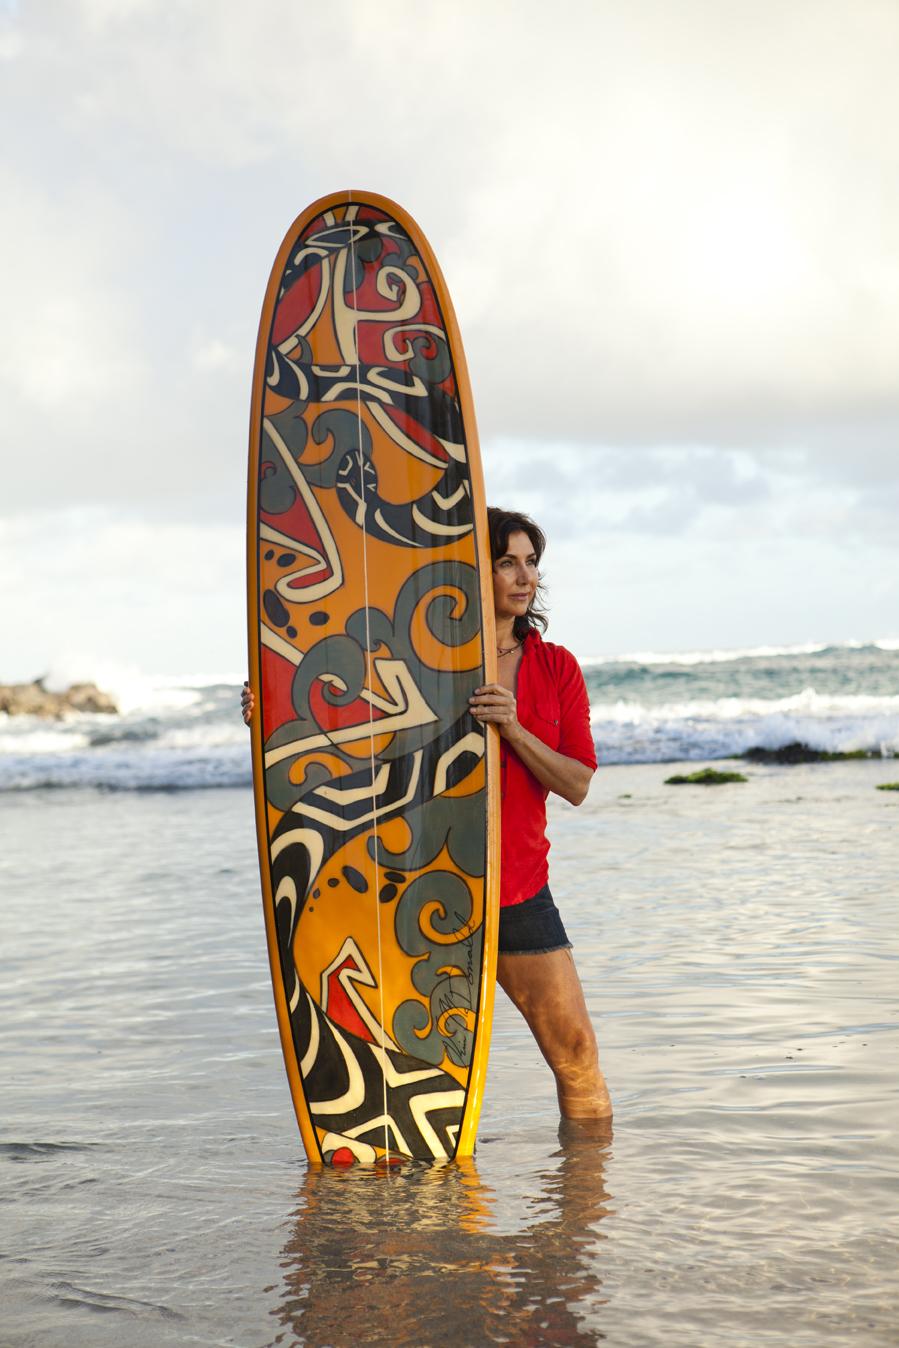 Kim McDonald holding painted surfboard, Kuau, Maui